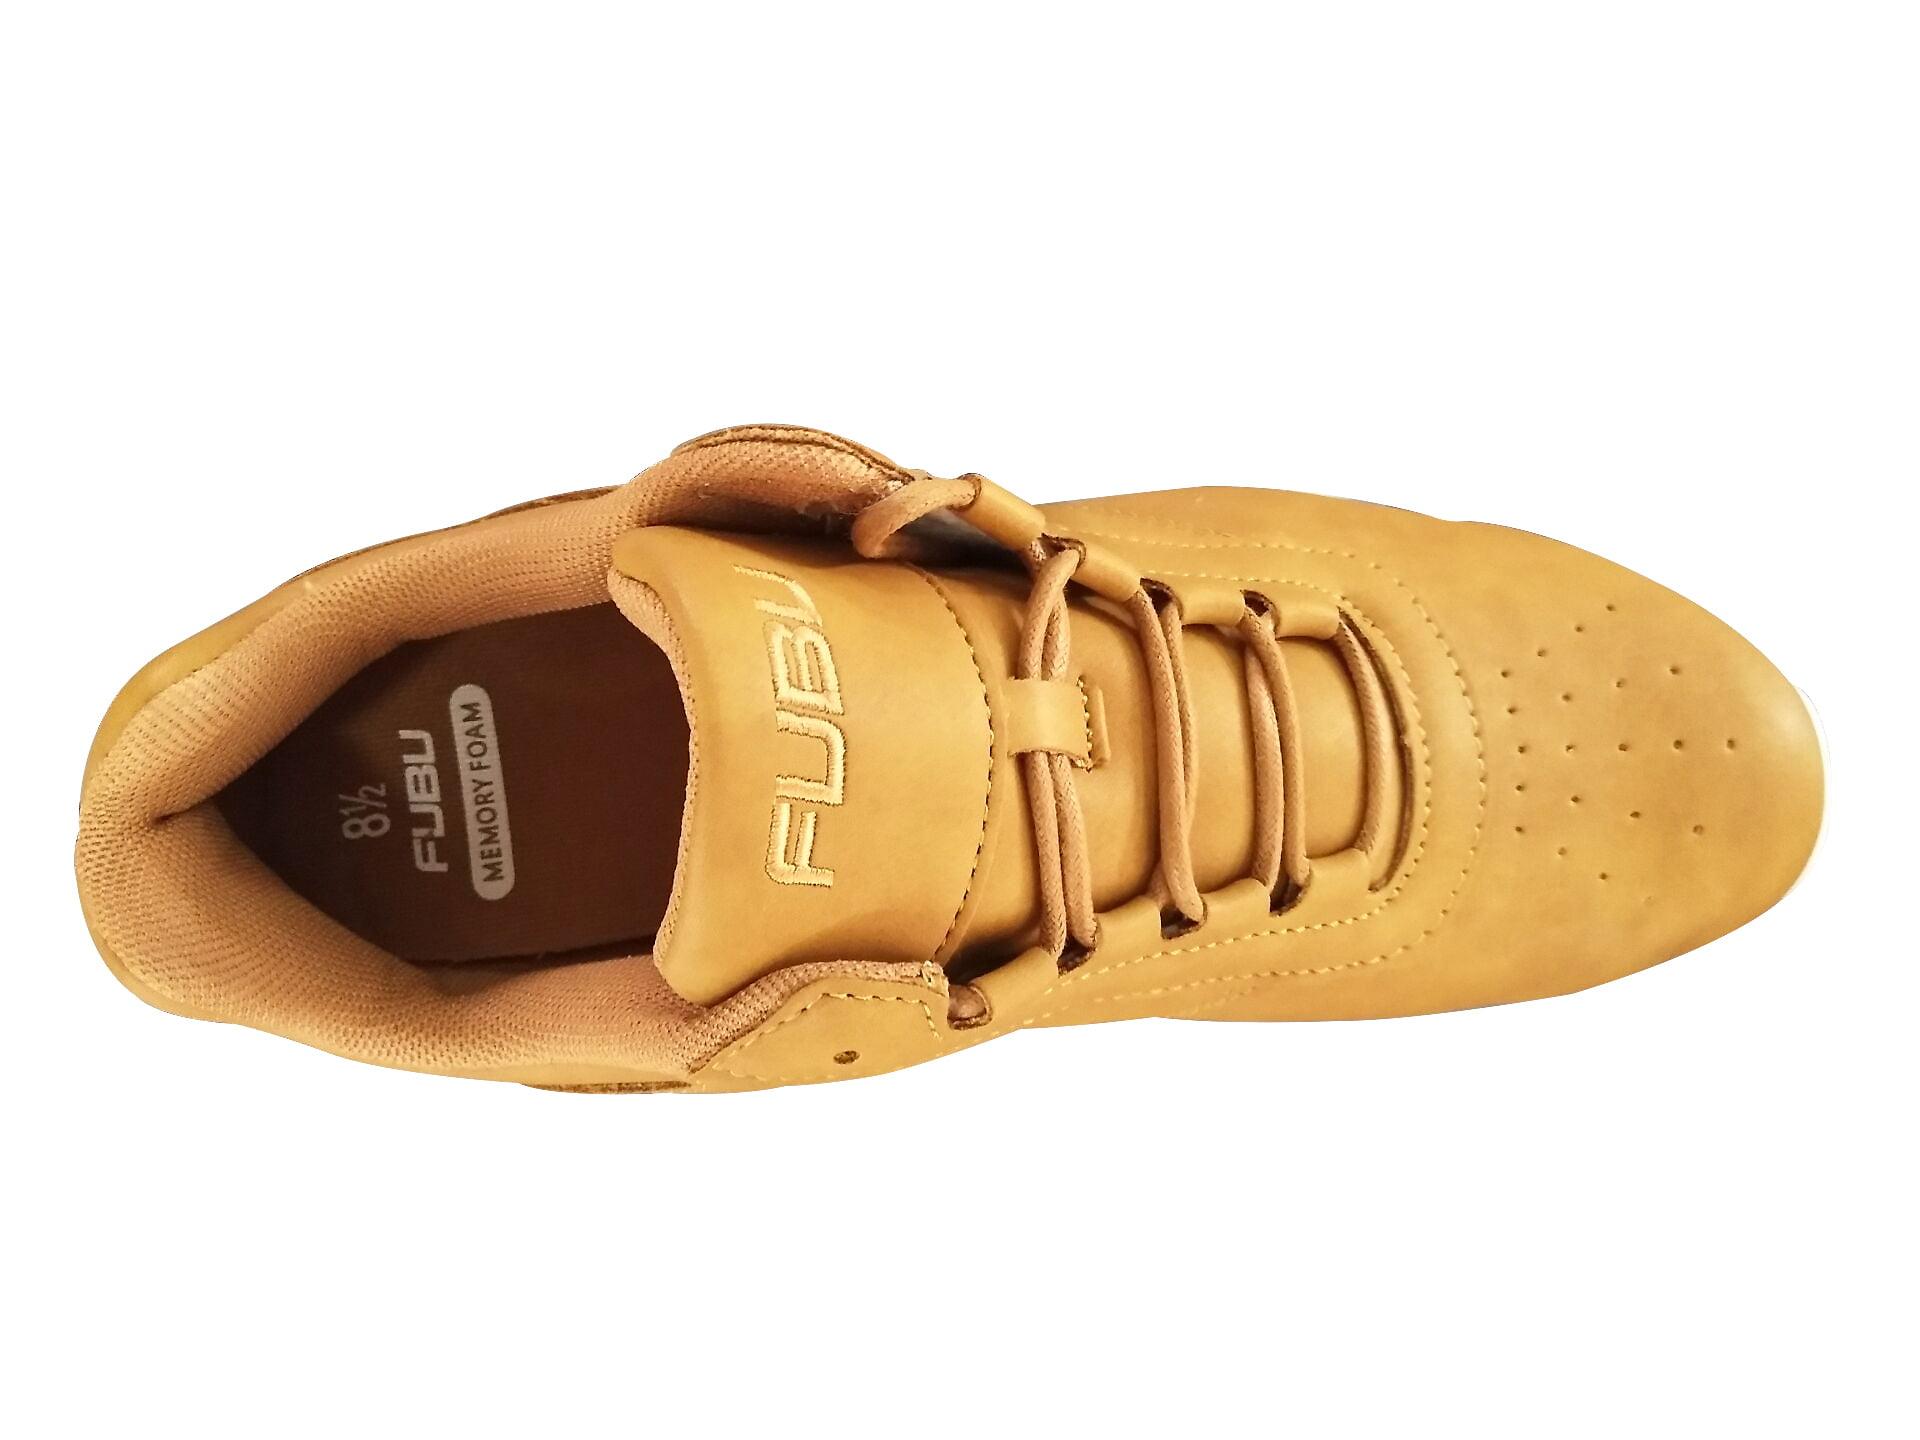 FUBU Men/'s Urban Lightweight Memory Foam Comfort Sneakers 9.5 /& 10.5 Wheat New